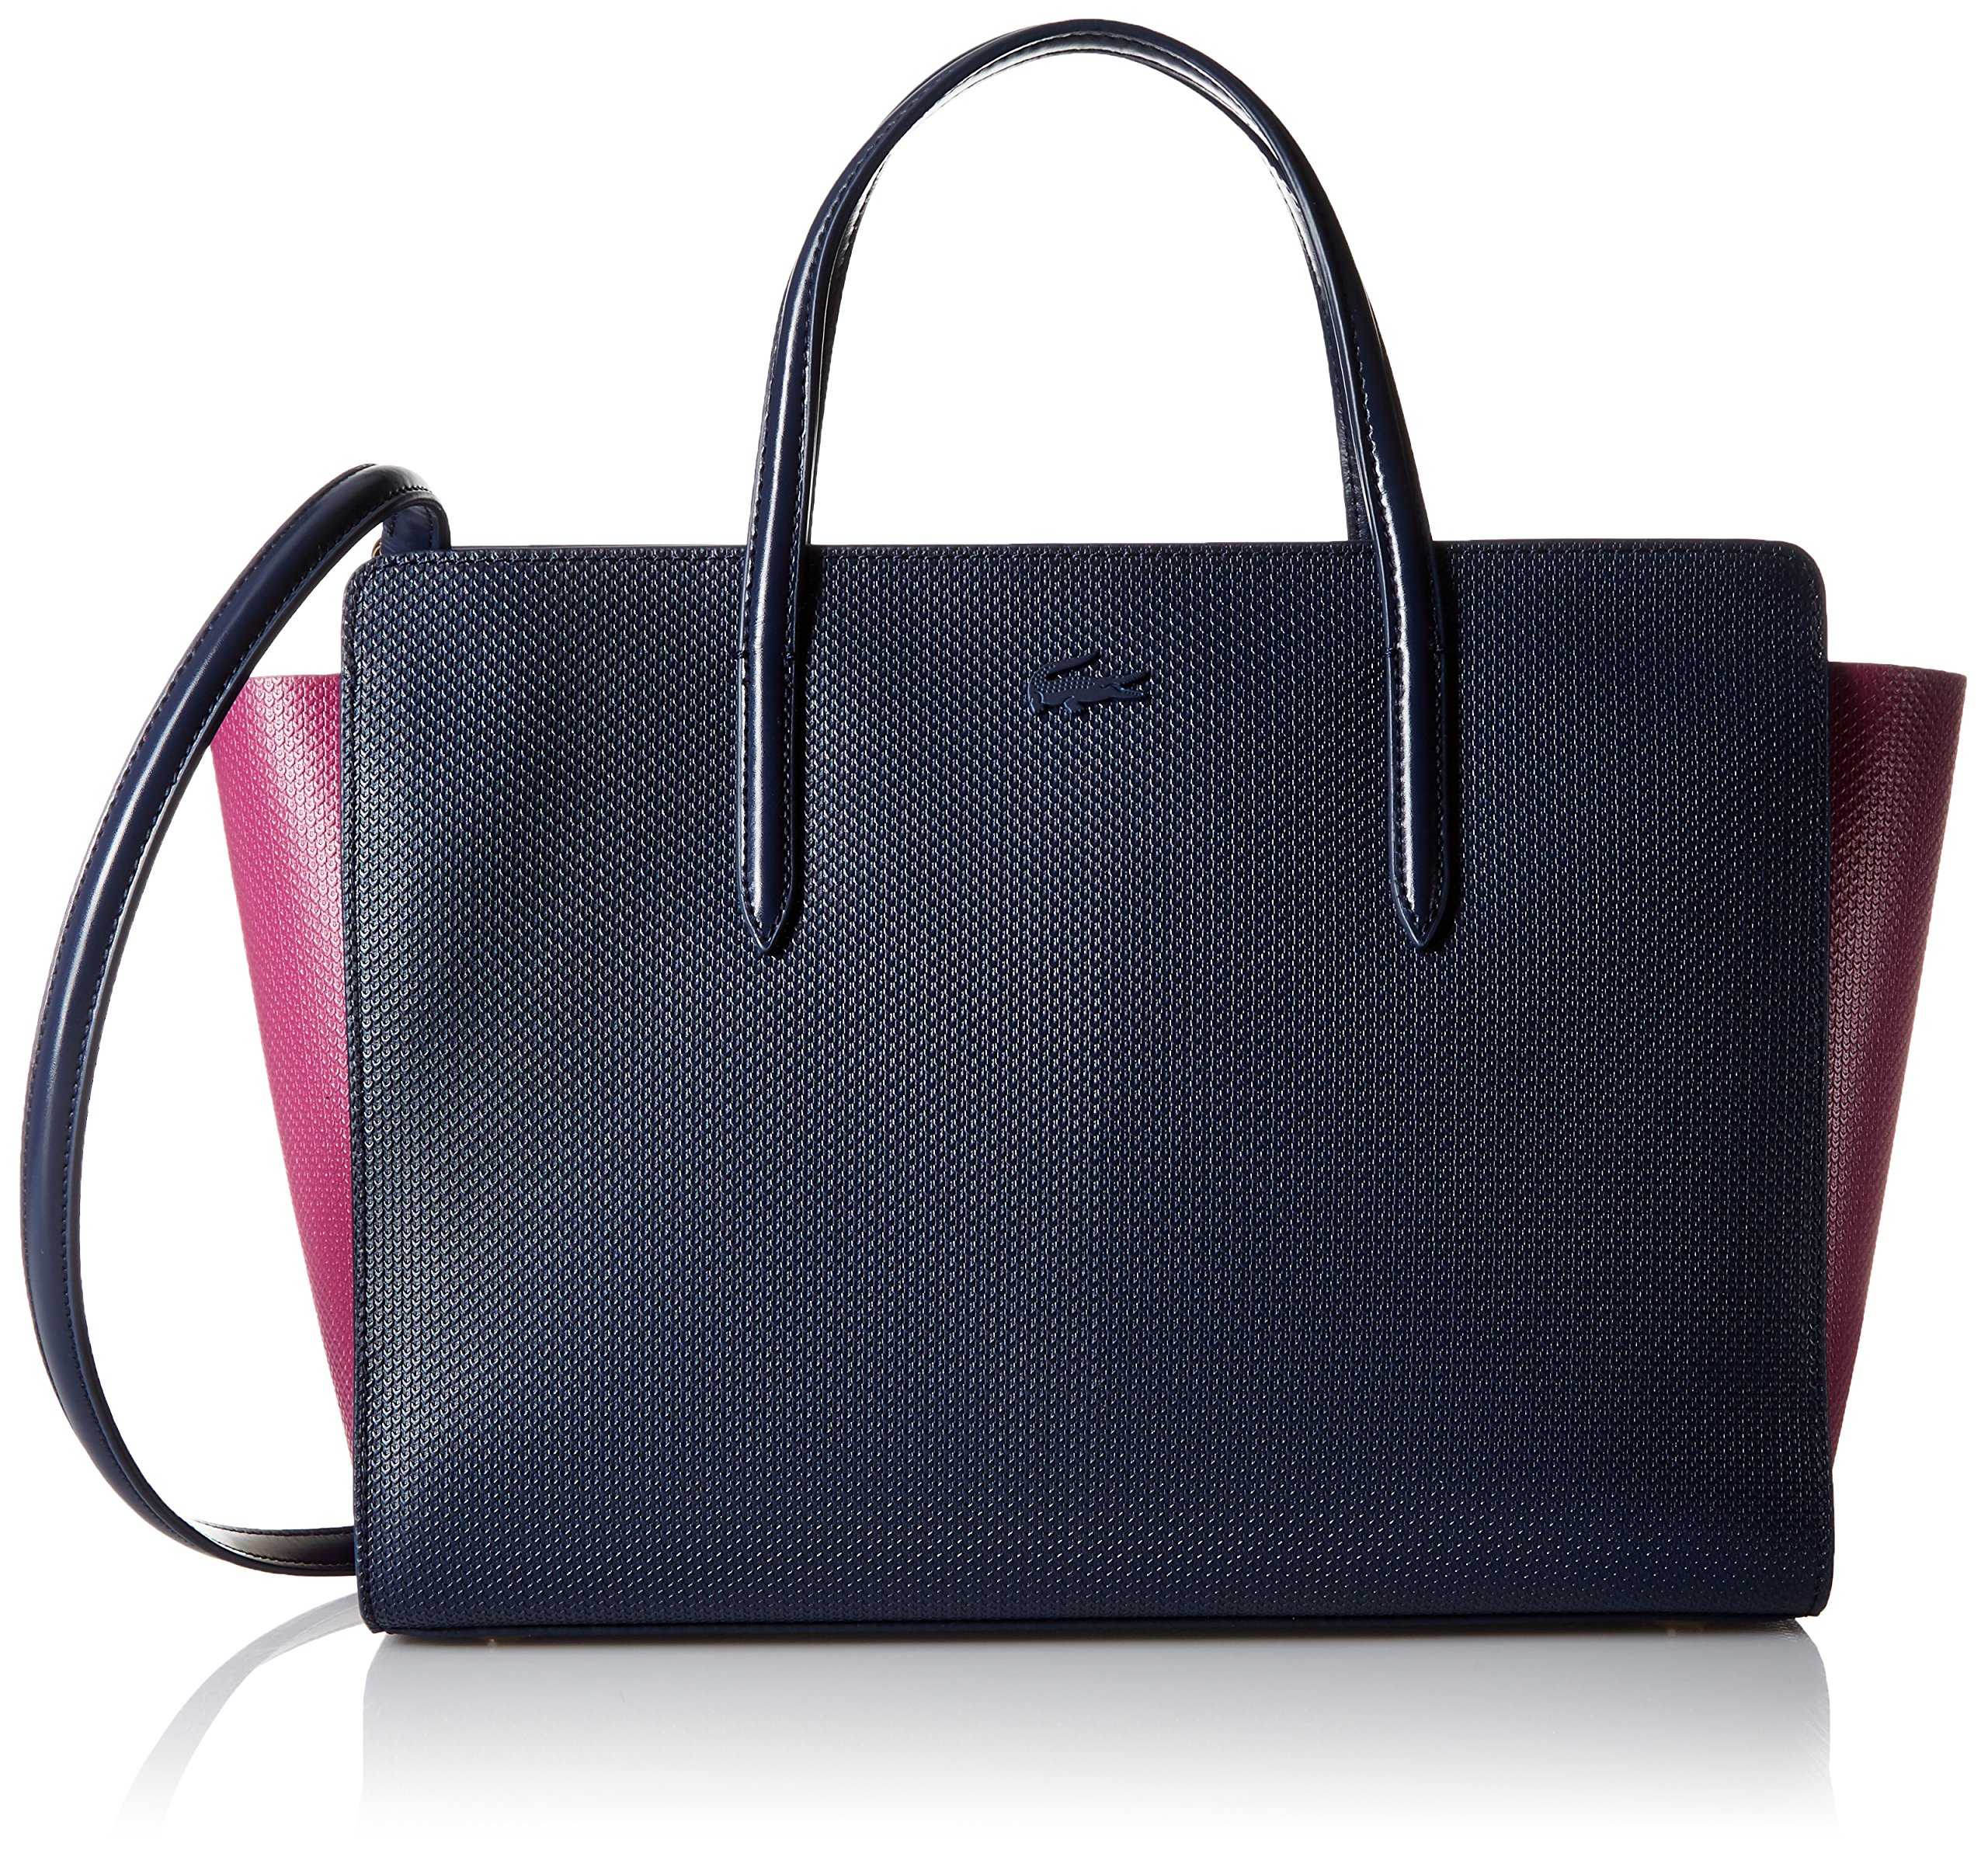 Lacoste Chantaco Color Block Shopping Bag, Peacoat/Boysenberry